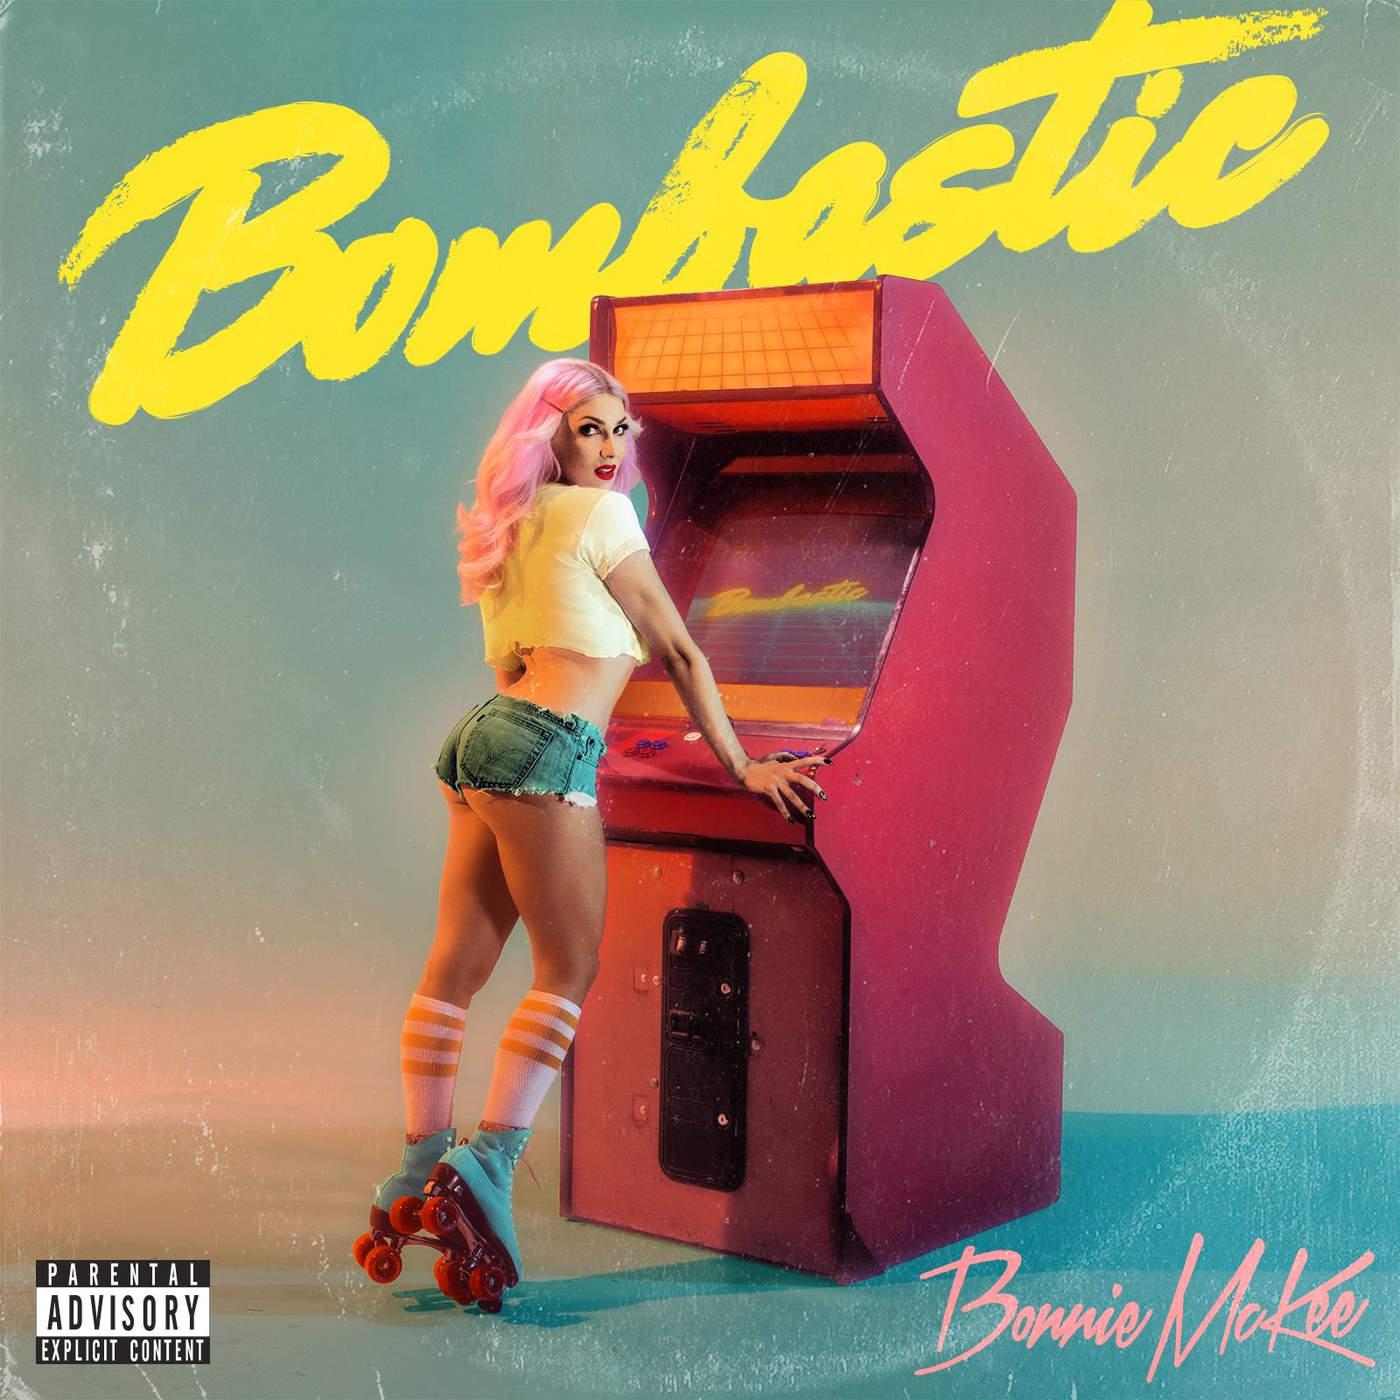 Bonnie McKee - Bombastic - EP Cover